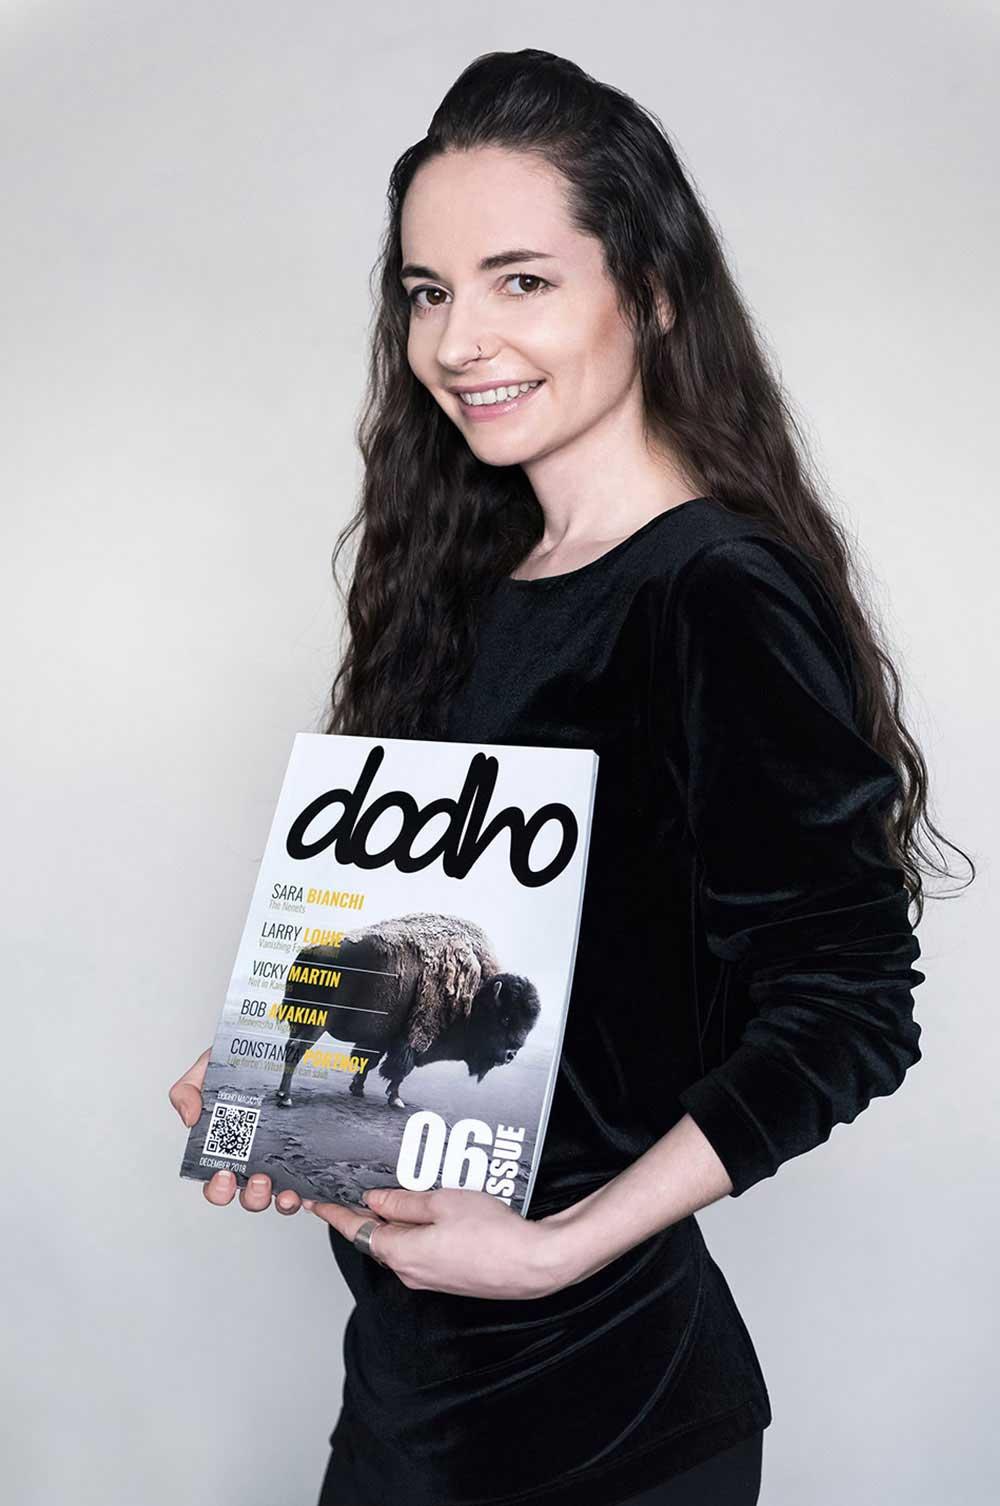 https://www.dodho.com/wp-content/uploads/2018/08/az2.jpg